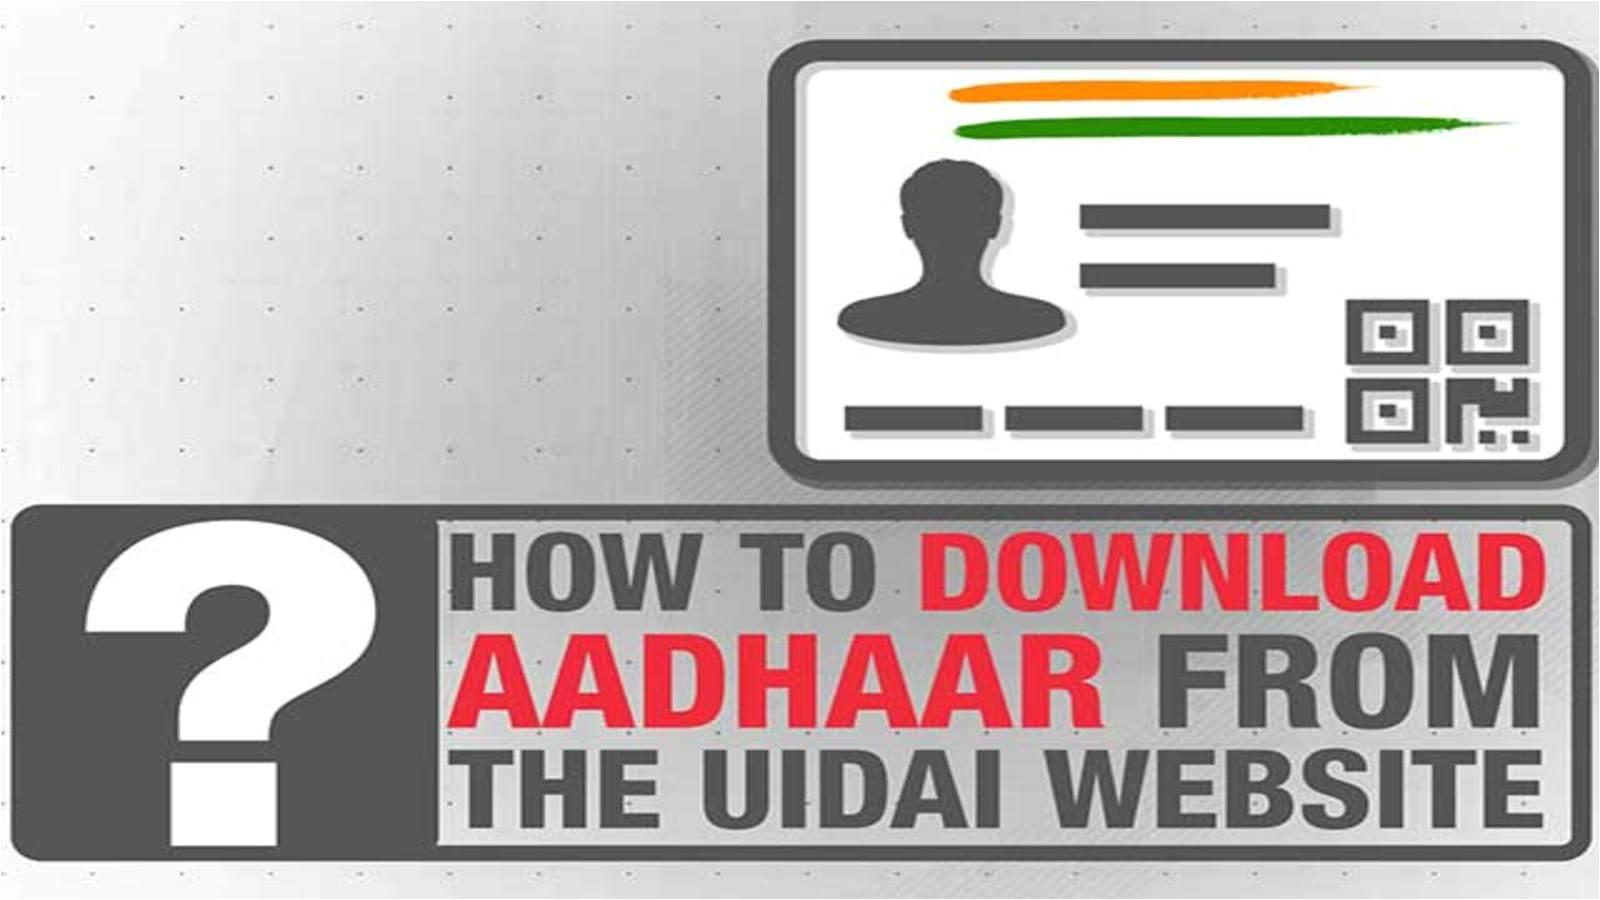 how to download aadhaar from the uidai website jpg